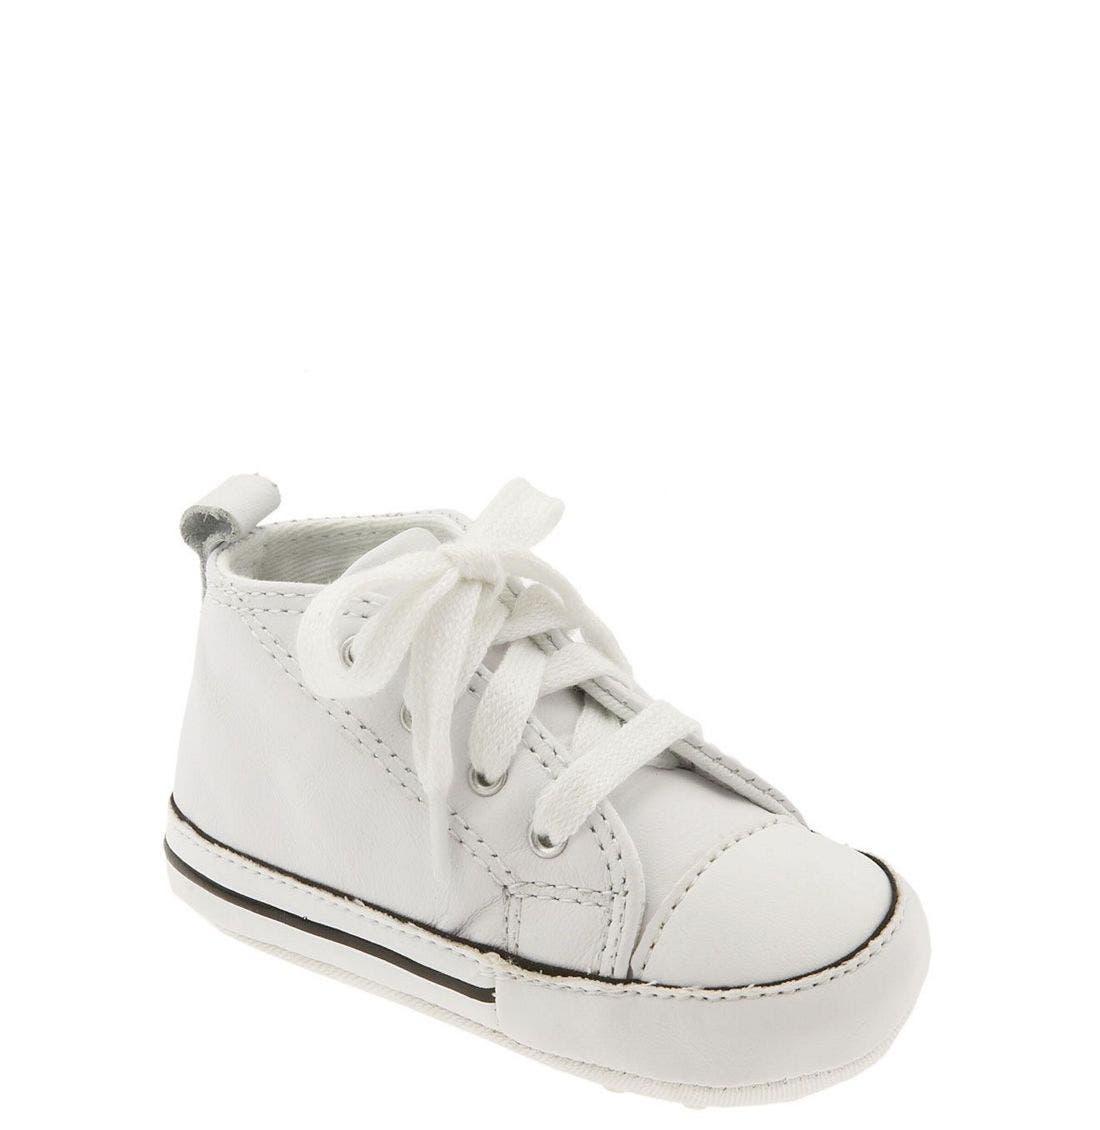 Main Image - Converse Chuck Taylor® Crib Sneaker (Baby)